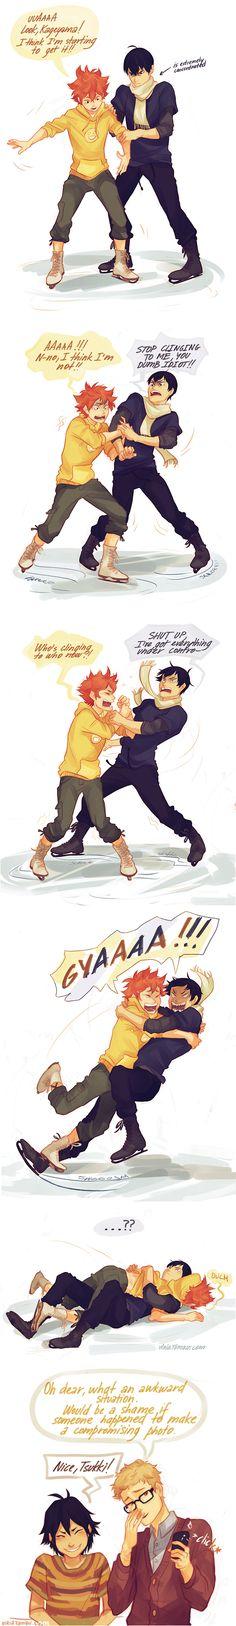 Haikyuu!! ~~ Ah, the Karasuno First Years go ice skating. What COULD go wrong? :: Artwork by viria.tumblr.com